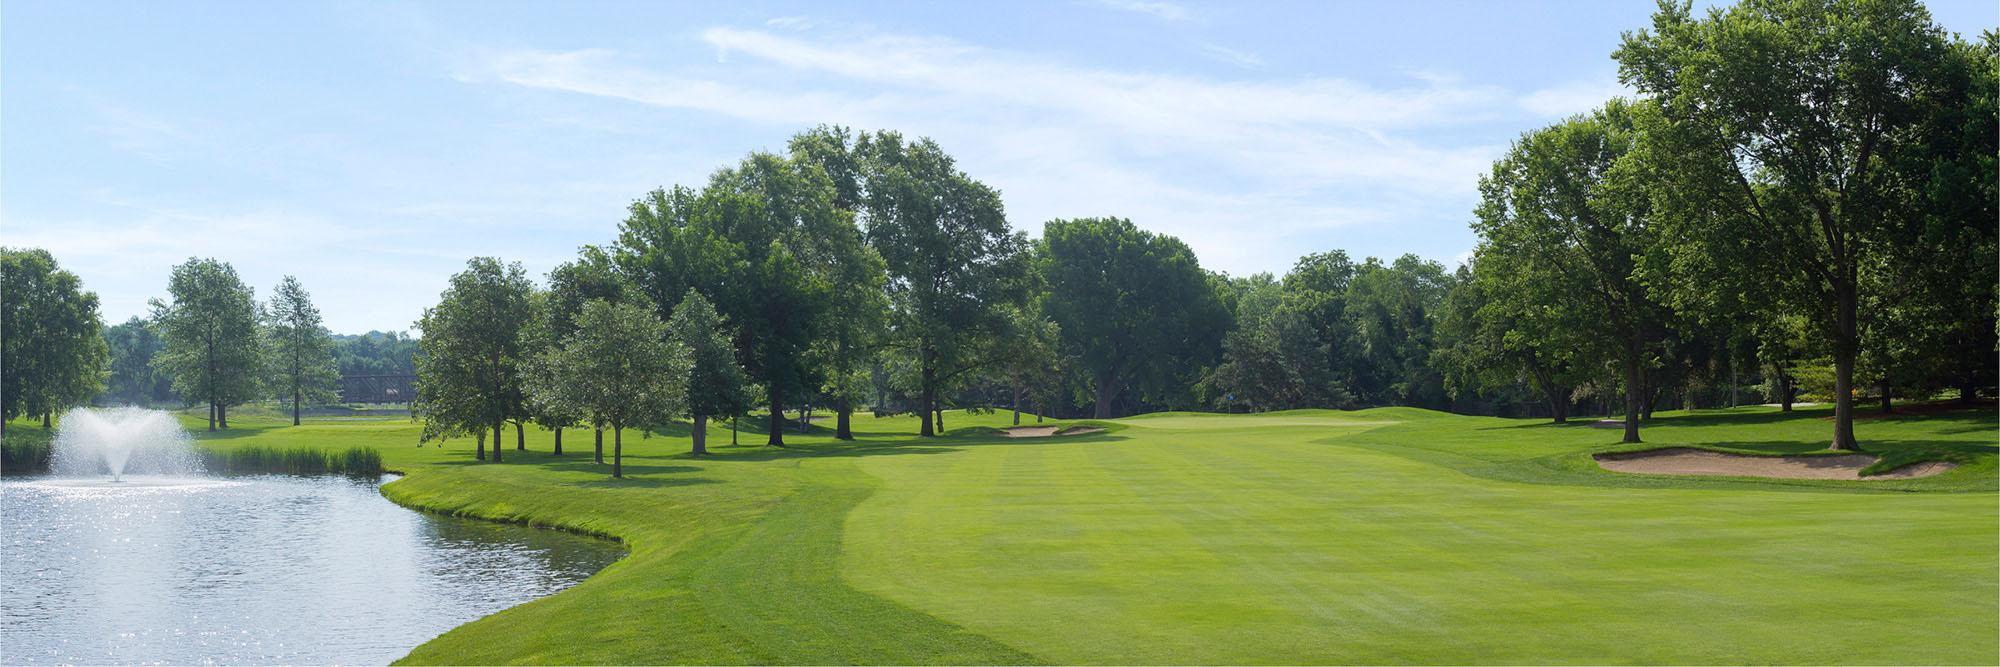 Golf Course Image - Happy Hollow Golf Club No. 14